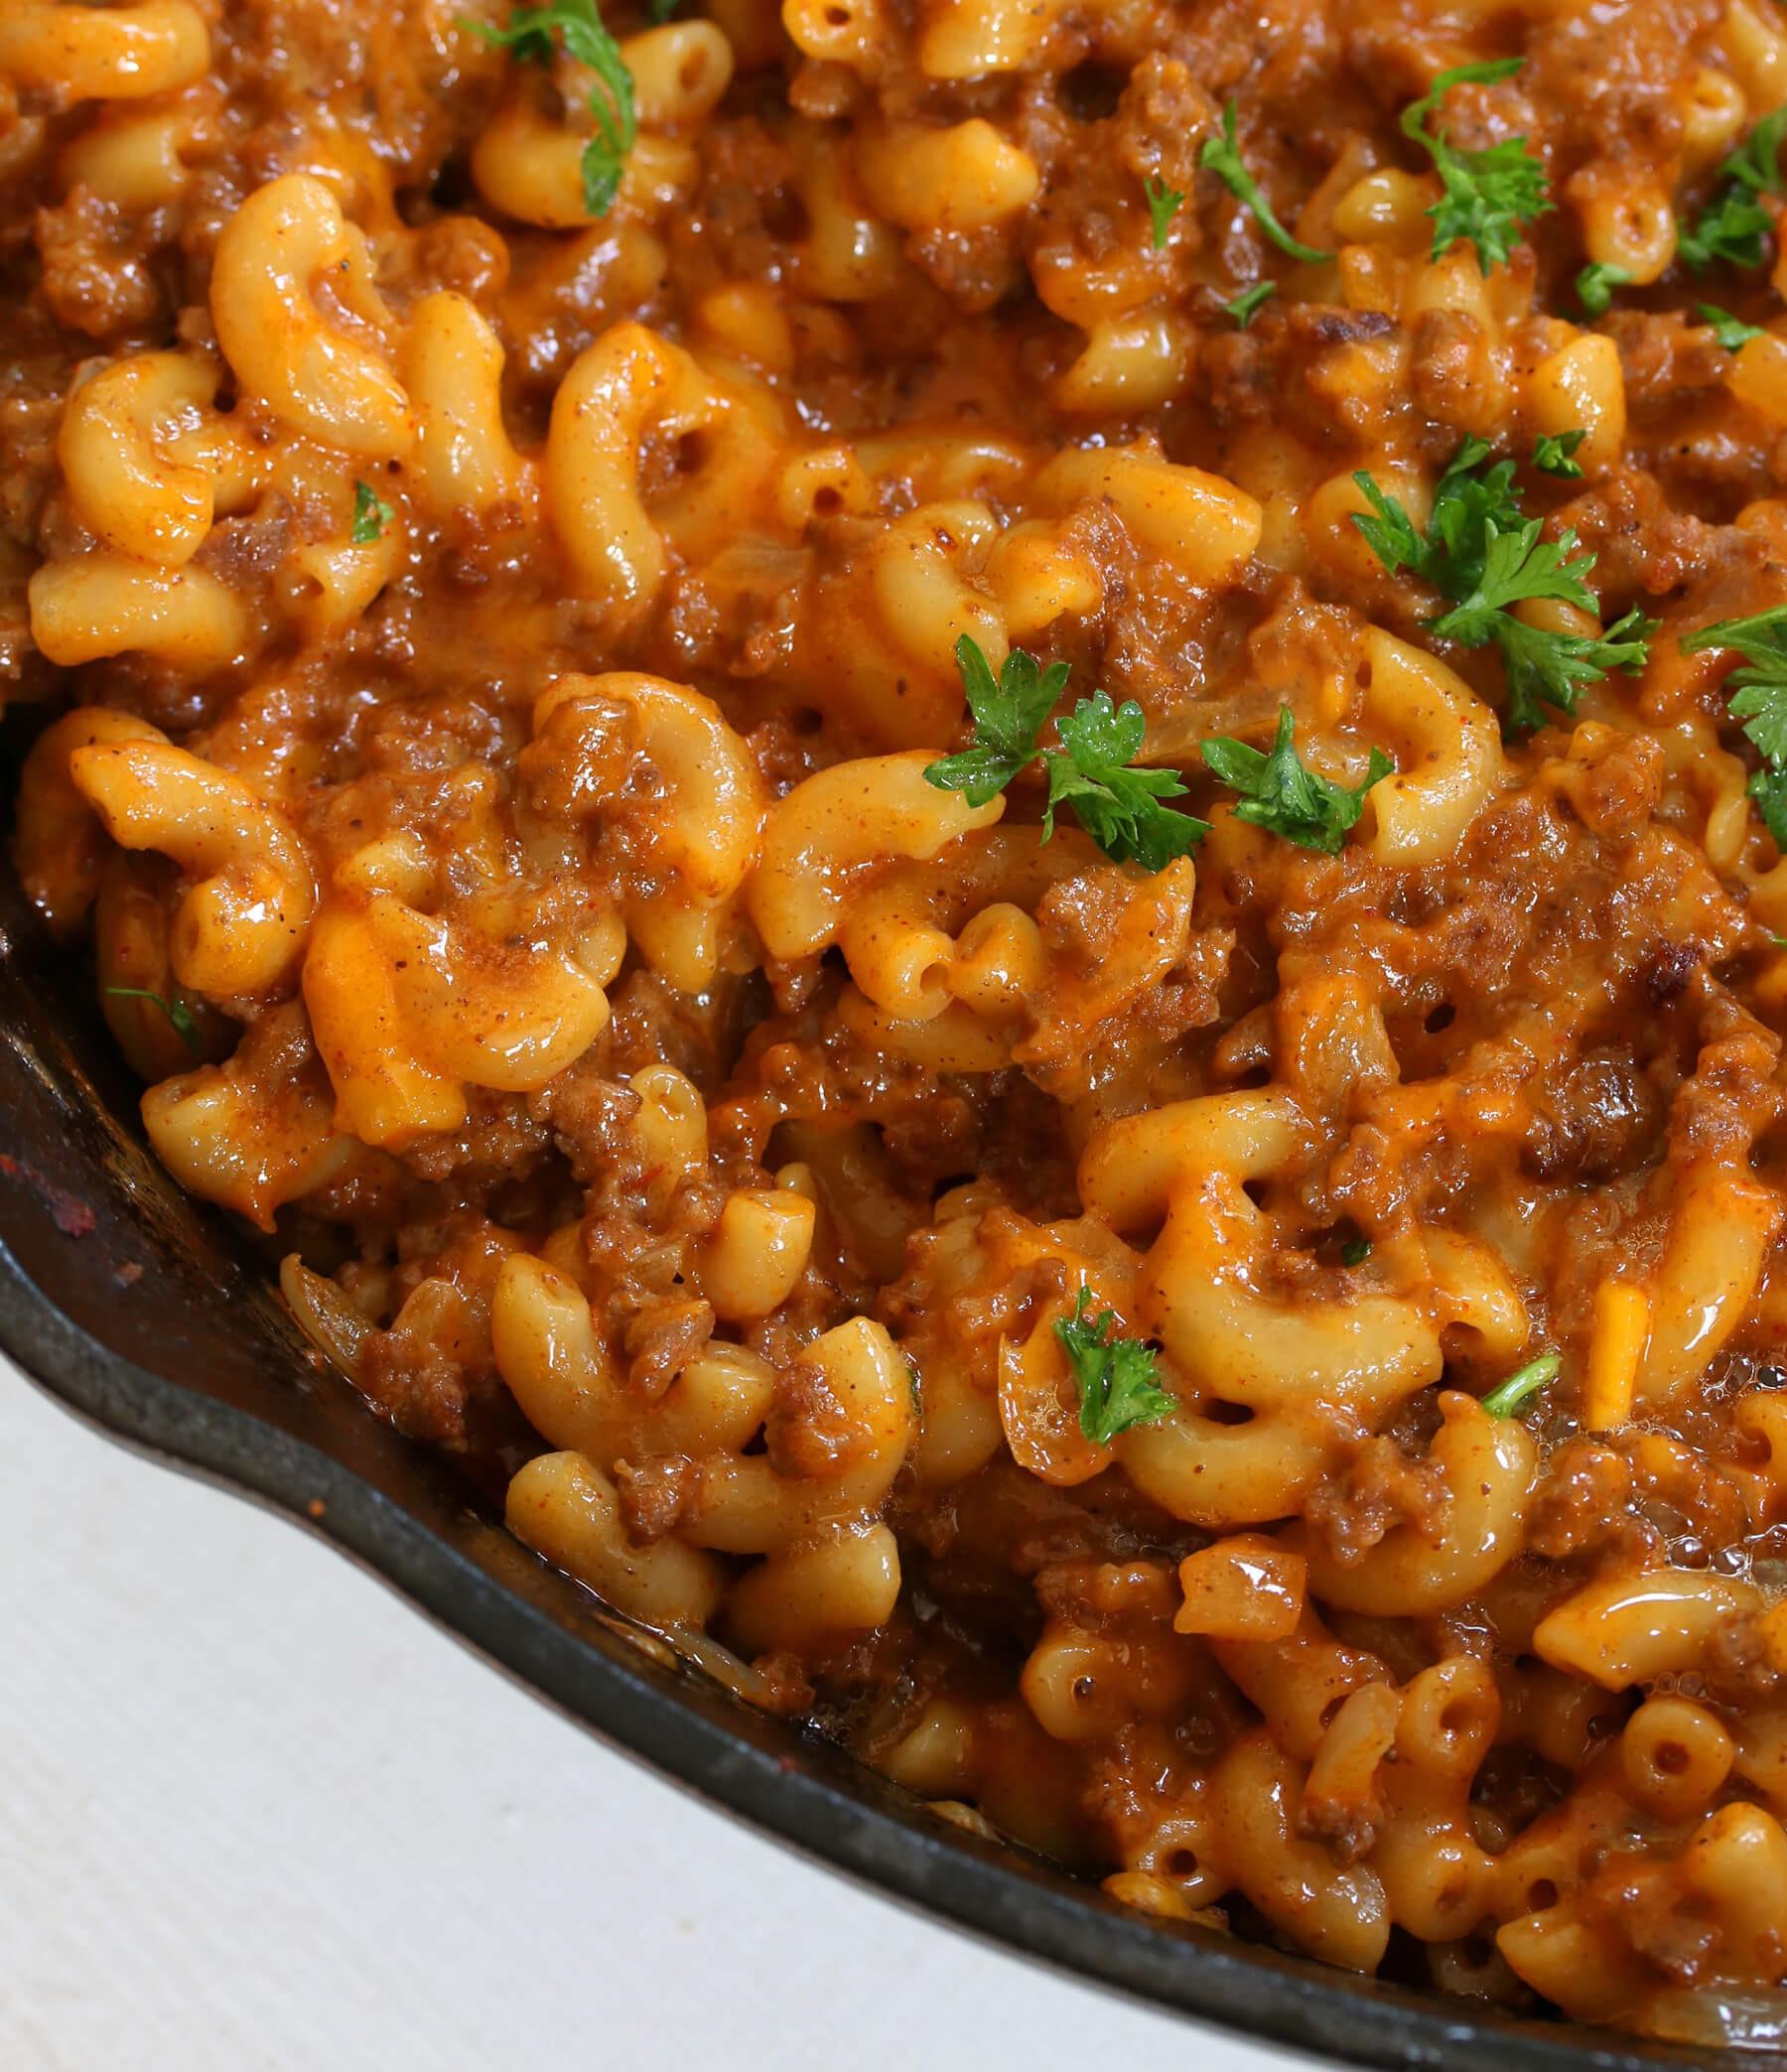 Homemade Hamburger Helper Recipe Skillet Dinner | Russell Haygood | Copy Me That